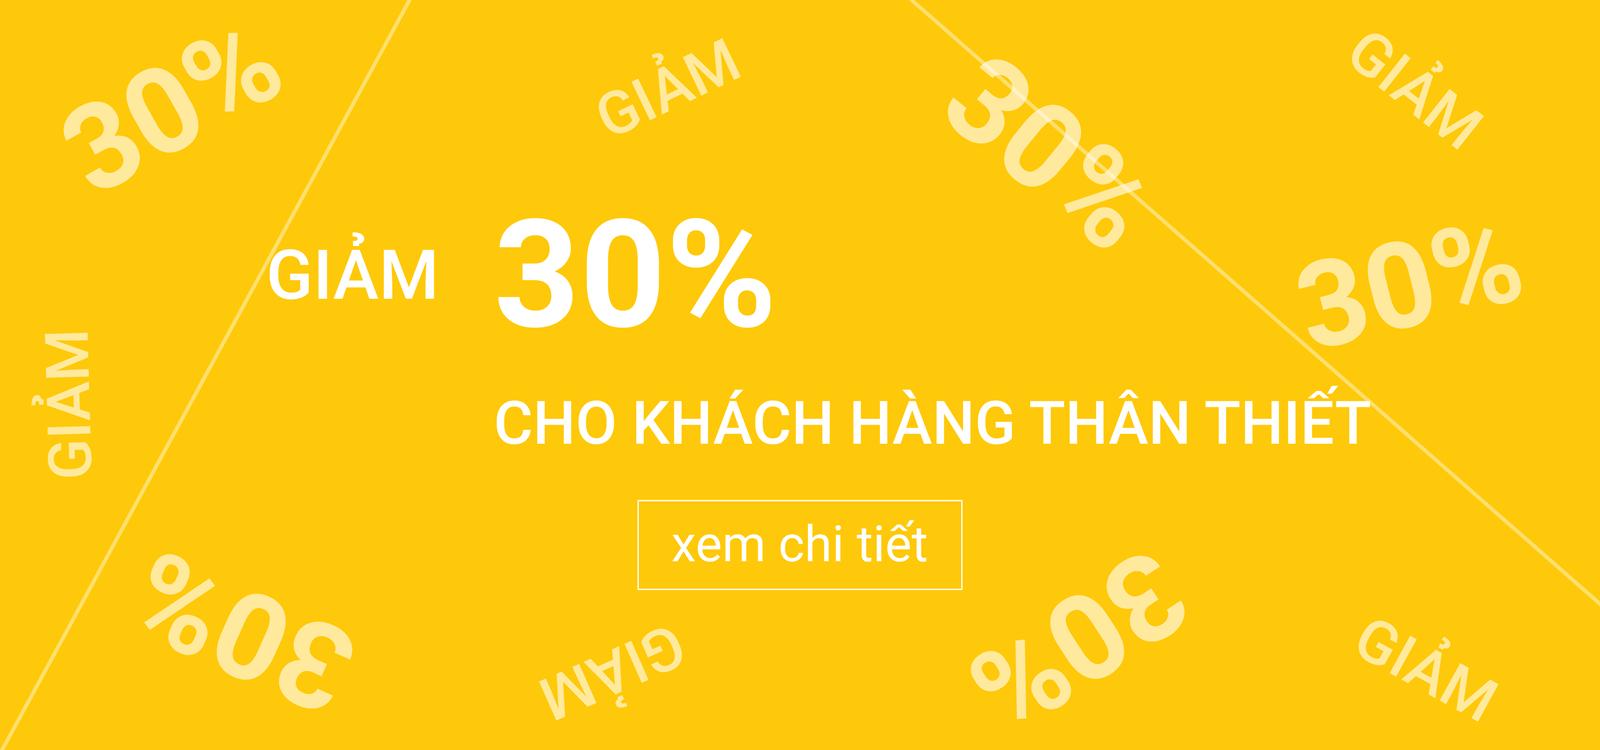 chuong-trinh-giam-30-%-cho-khach-hang-than-thiet